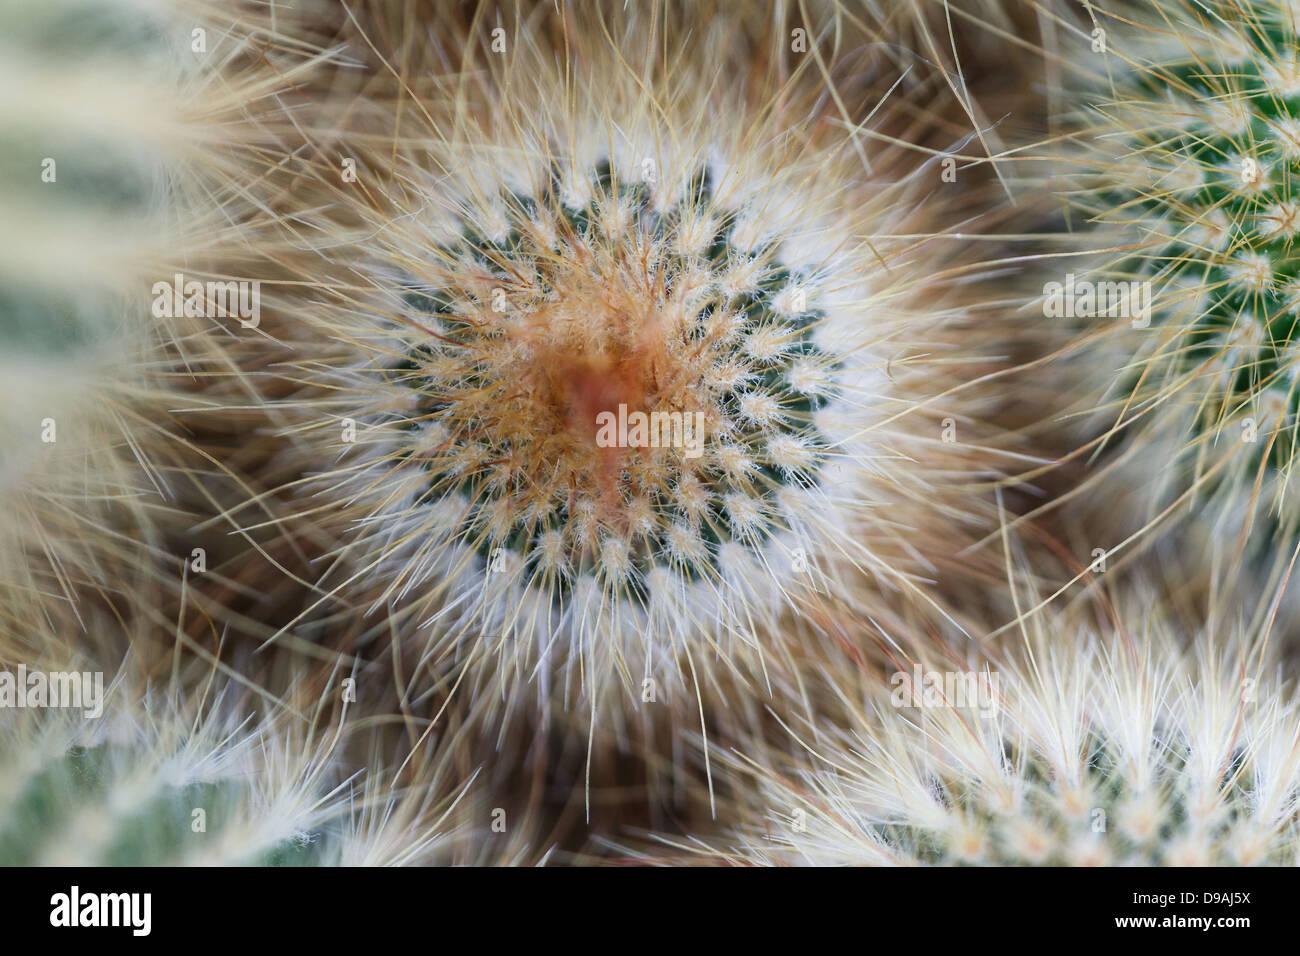 Mammillaria sp Kaktus zeigt Symmetrie. Stockbild